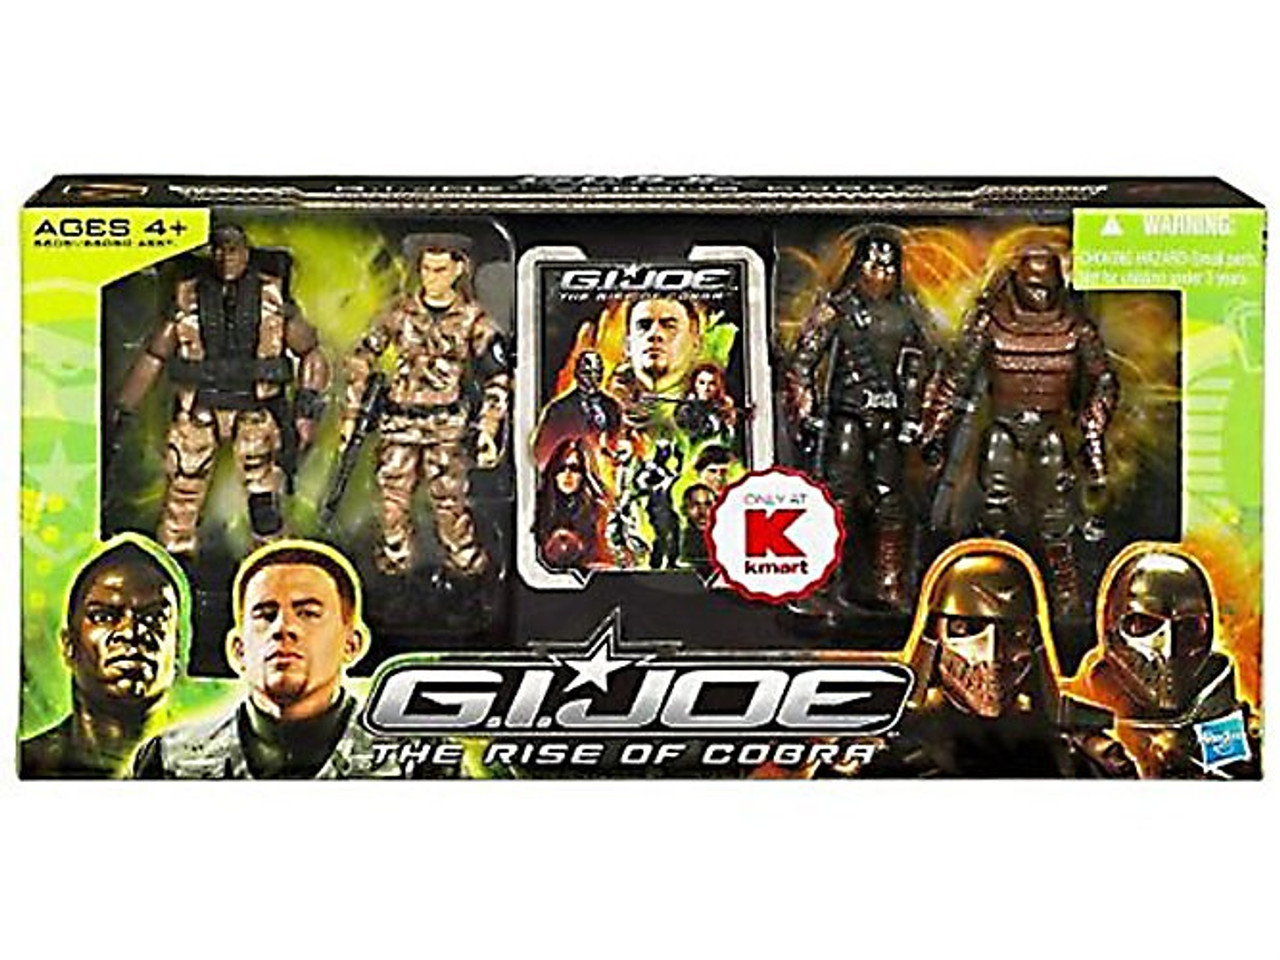 The Rise of Cobra GI Joe Vs. Cobra Exclusive Action Figure 4-Pack